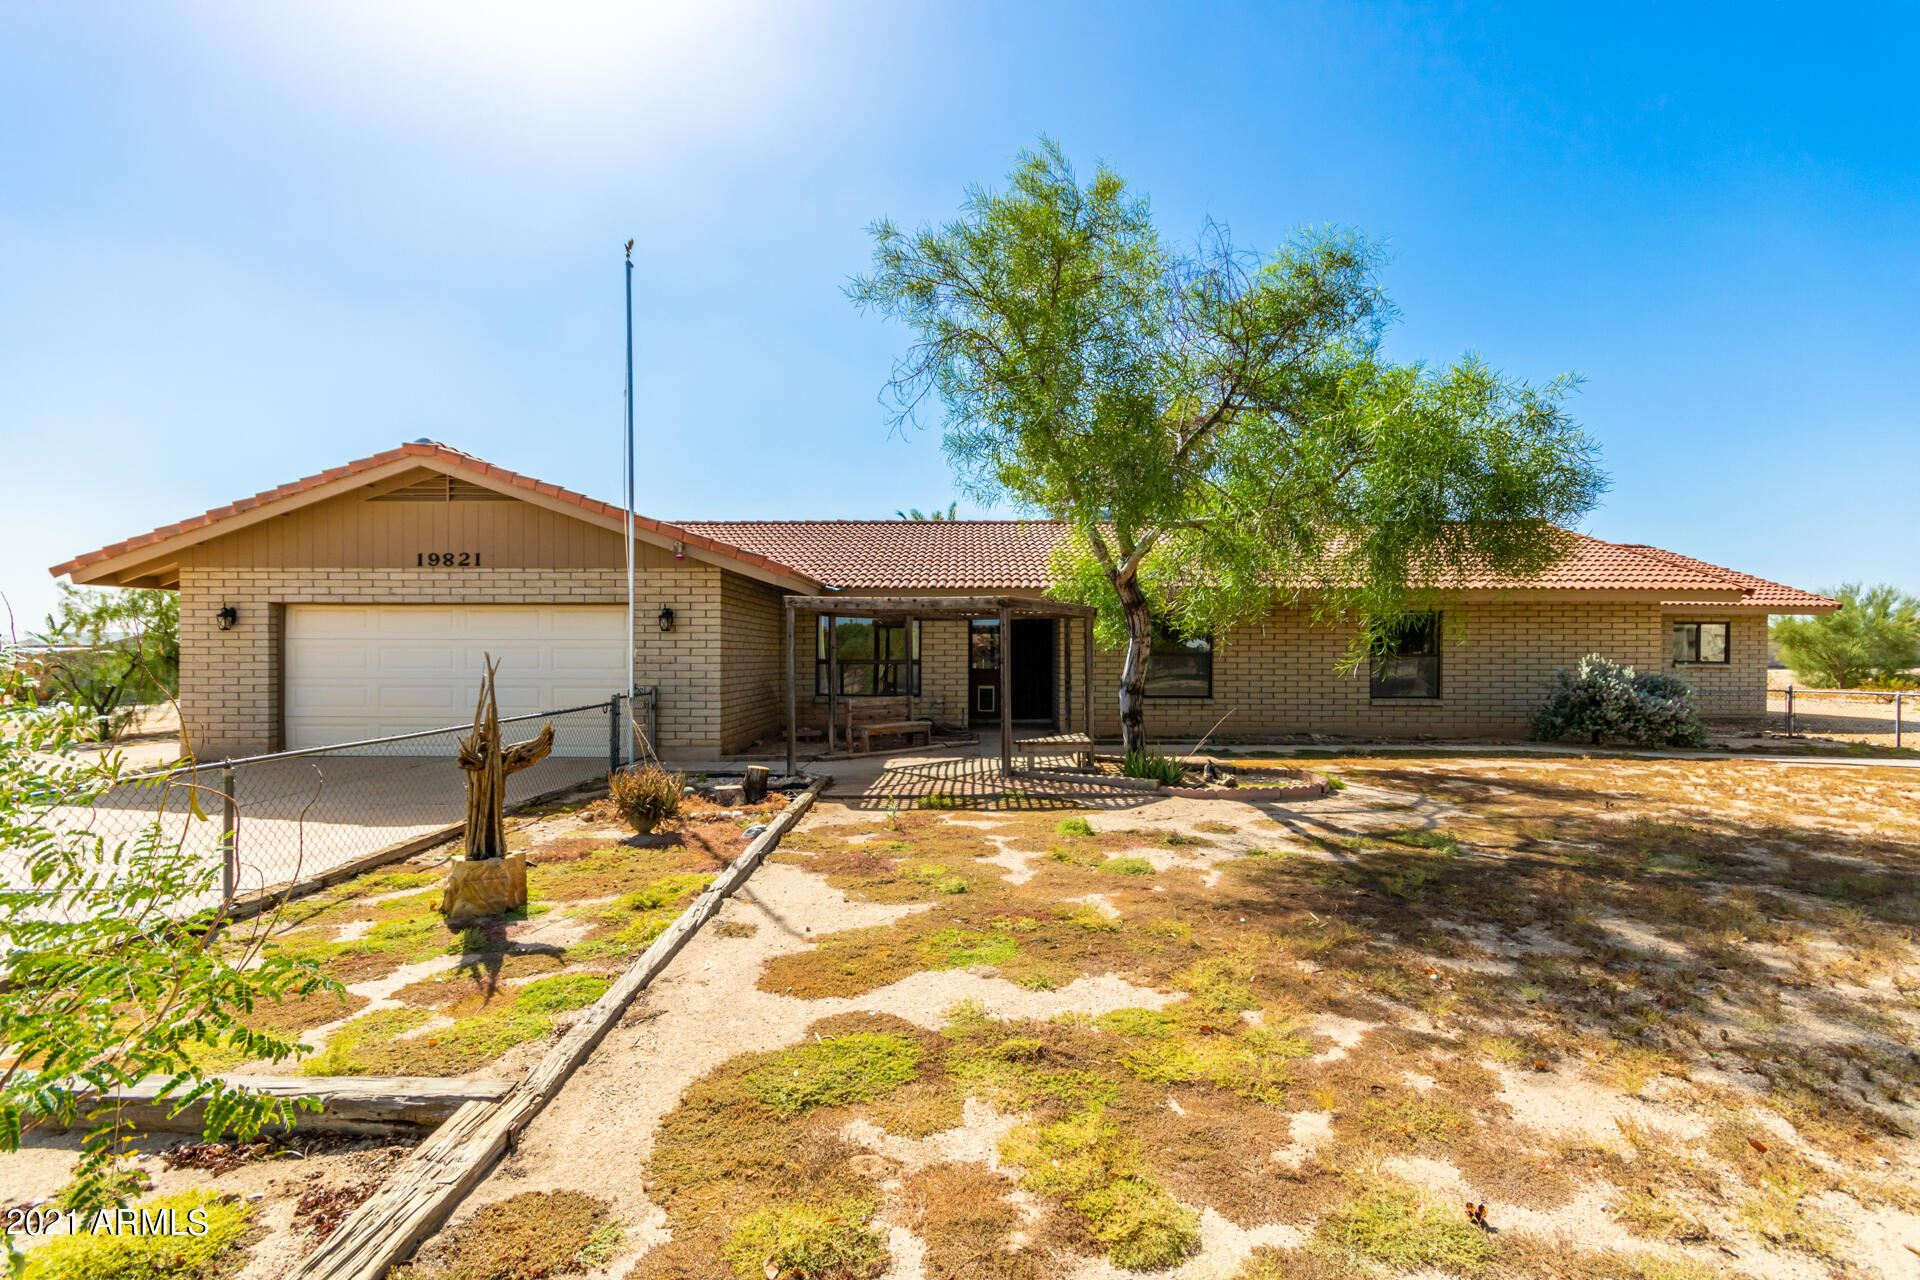 Photo of 19821 W Medlock Drive, Litchfield Park, AZ 85340 (MLS # 6306532)